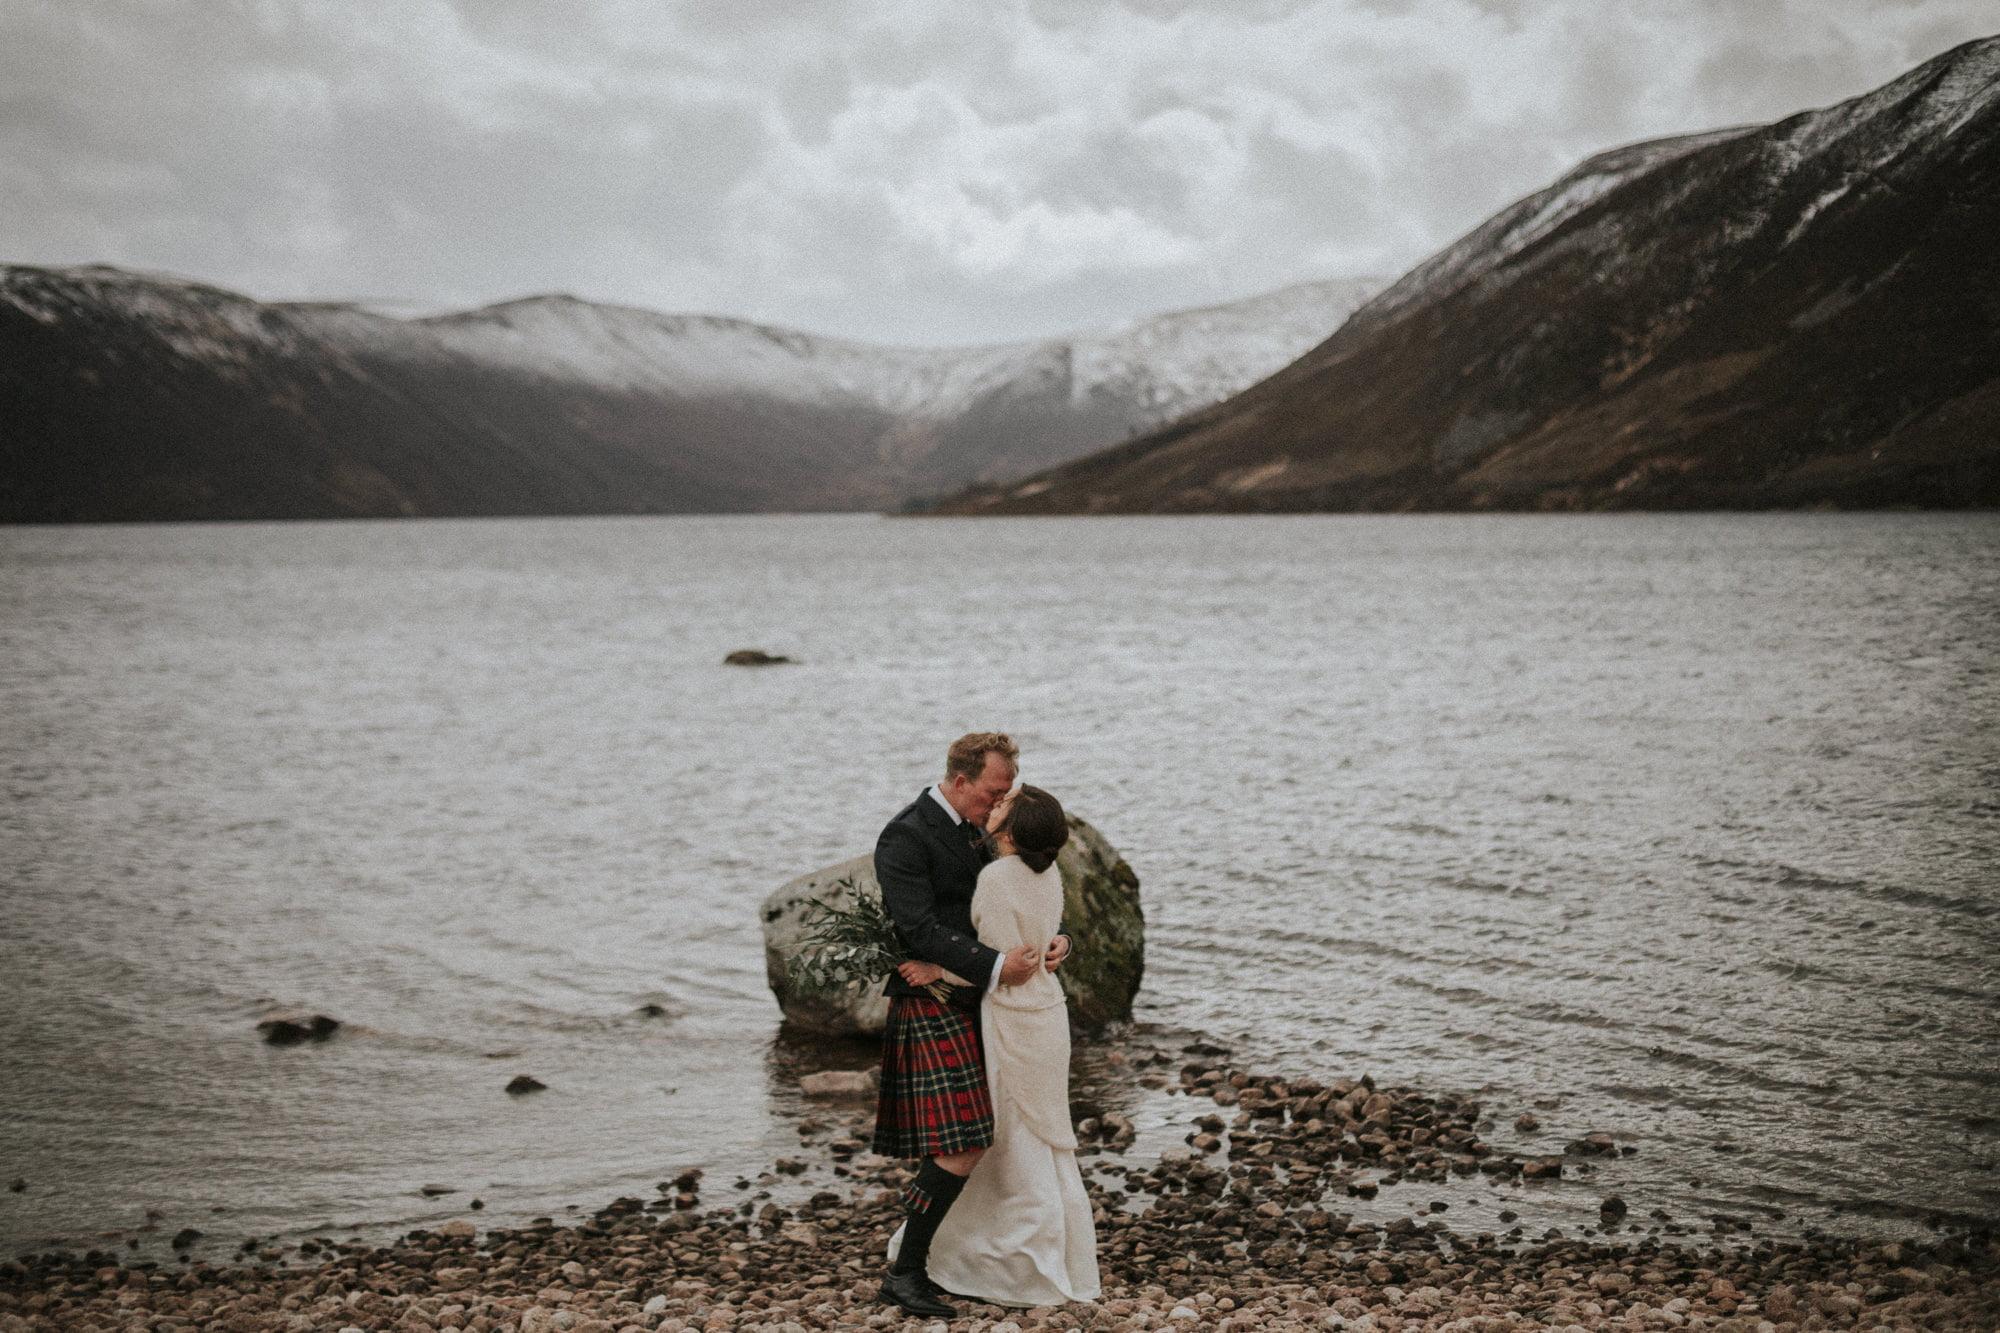 Loch Muick elopement, Adventurous Scottish elopement wedding at Loch Muick in the Cairngorms National Park